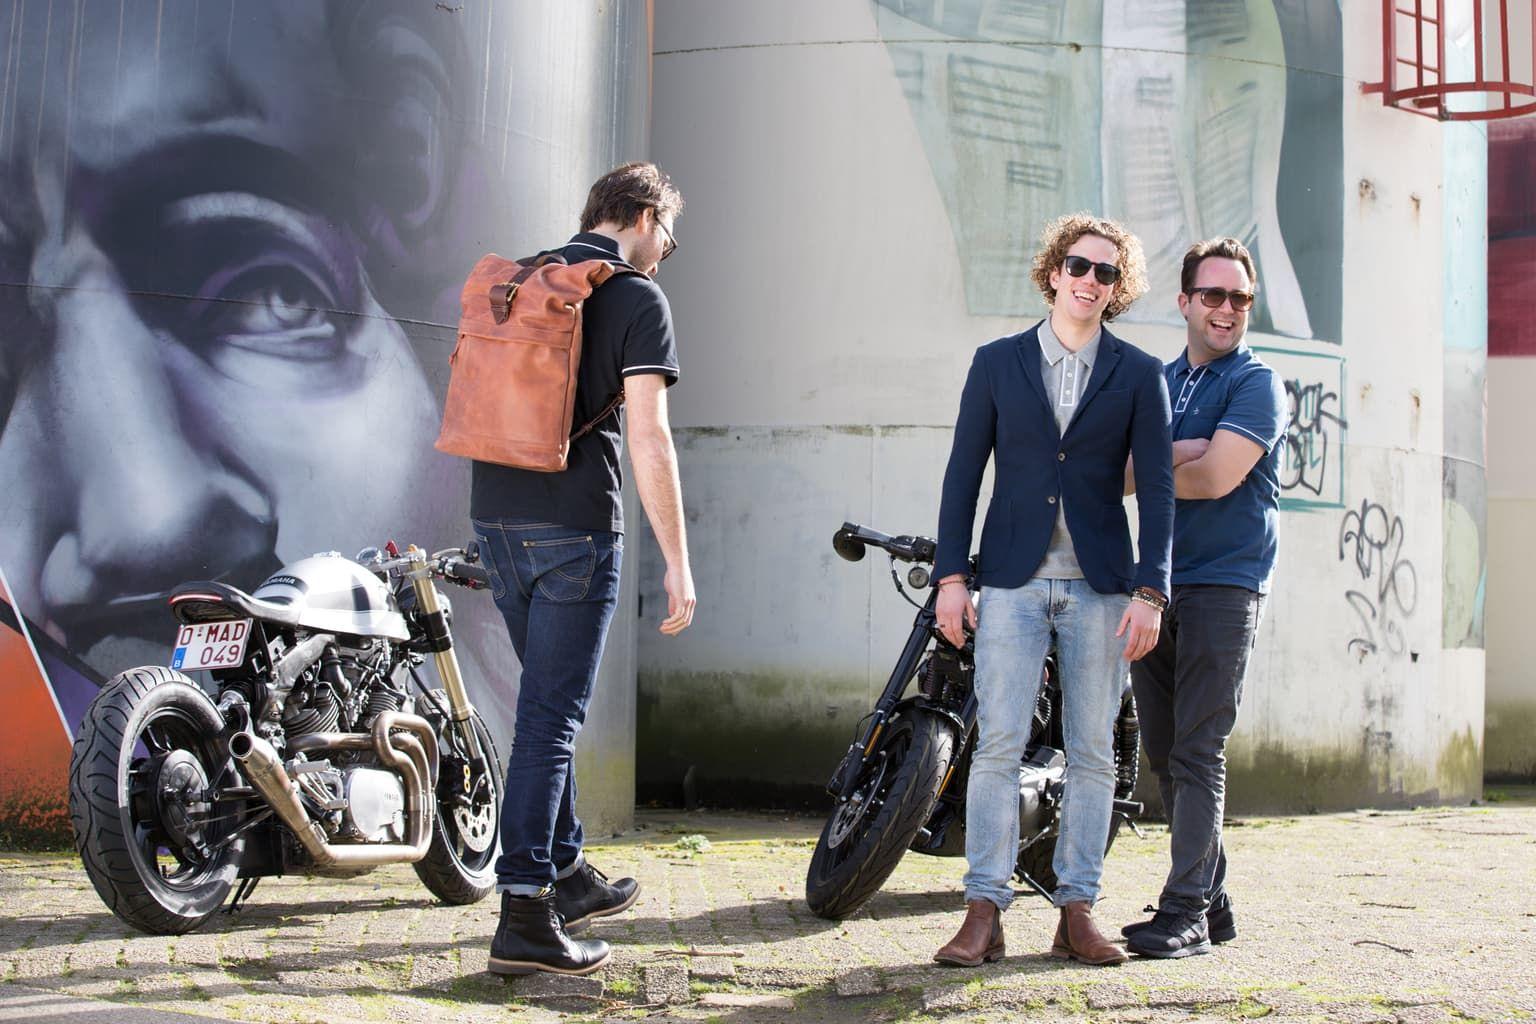 Stijlvol Motorrijden-2017-12  - Riding in style | Spring 2017 - Manify.nl